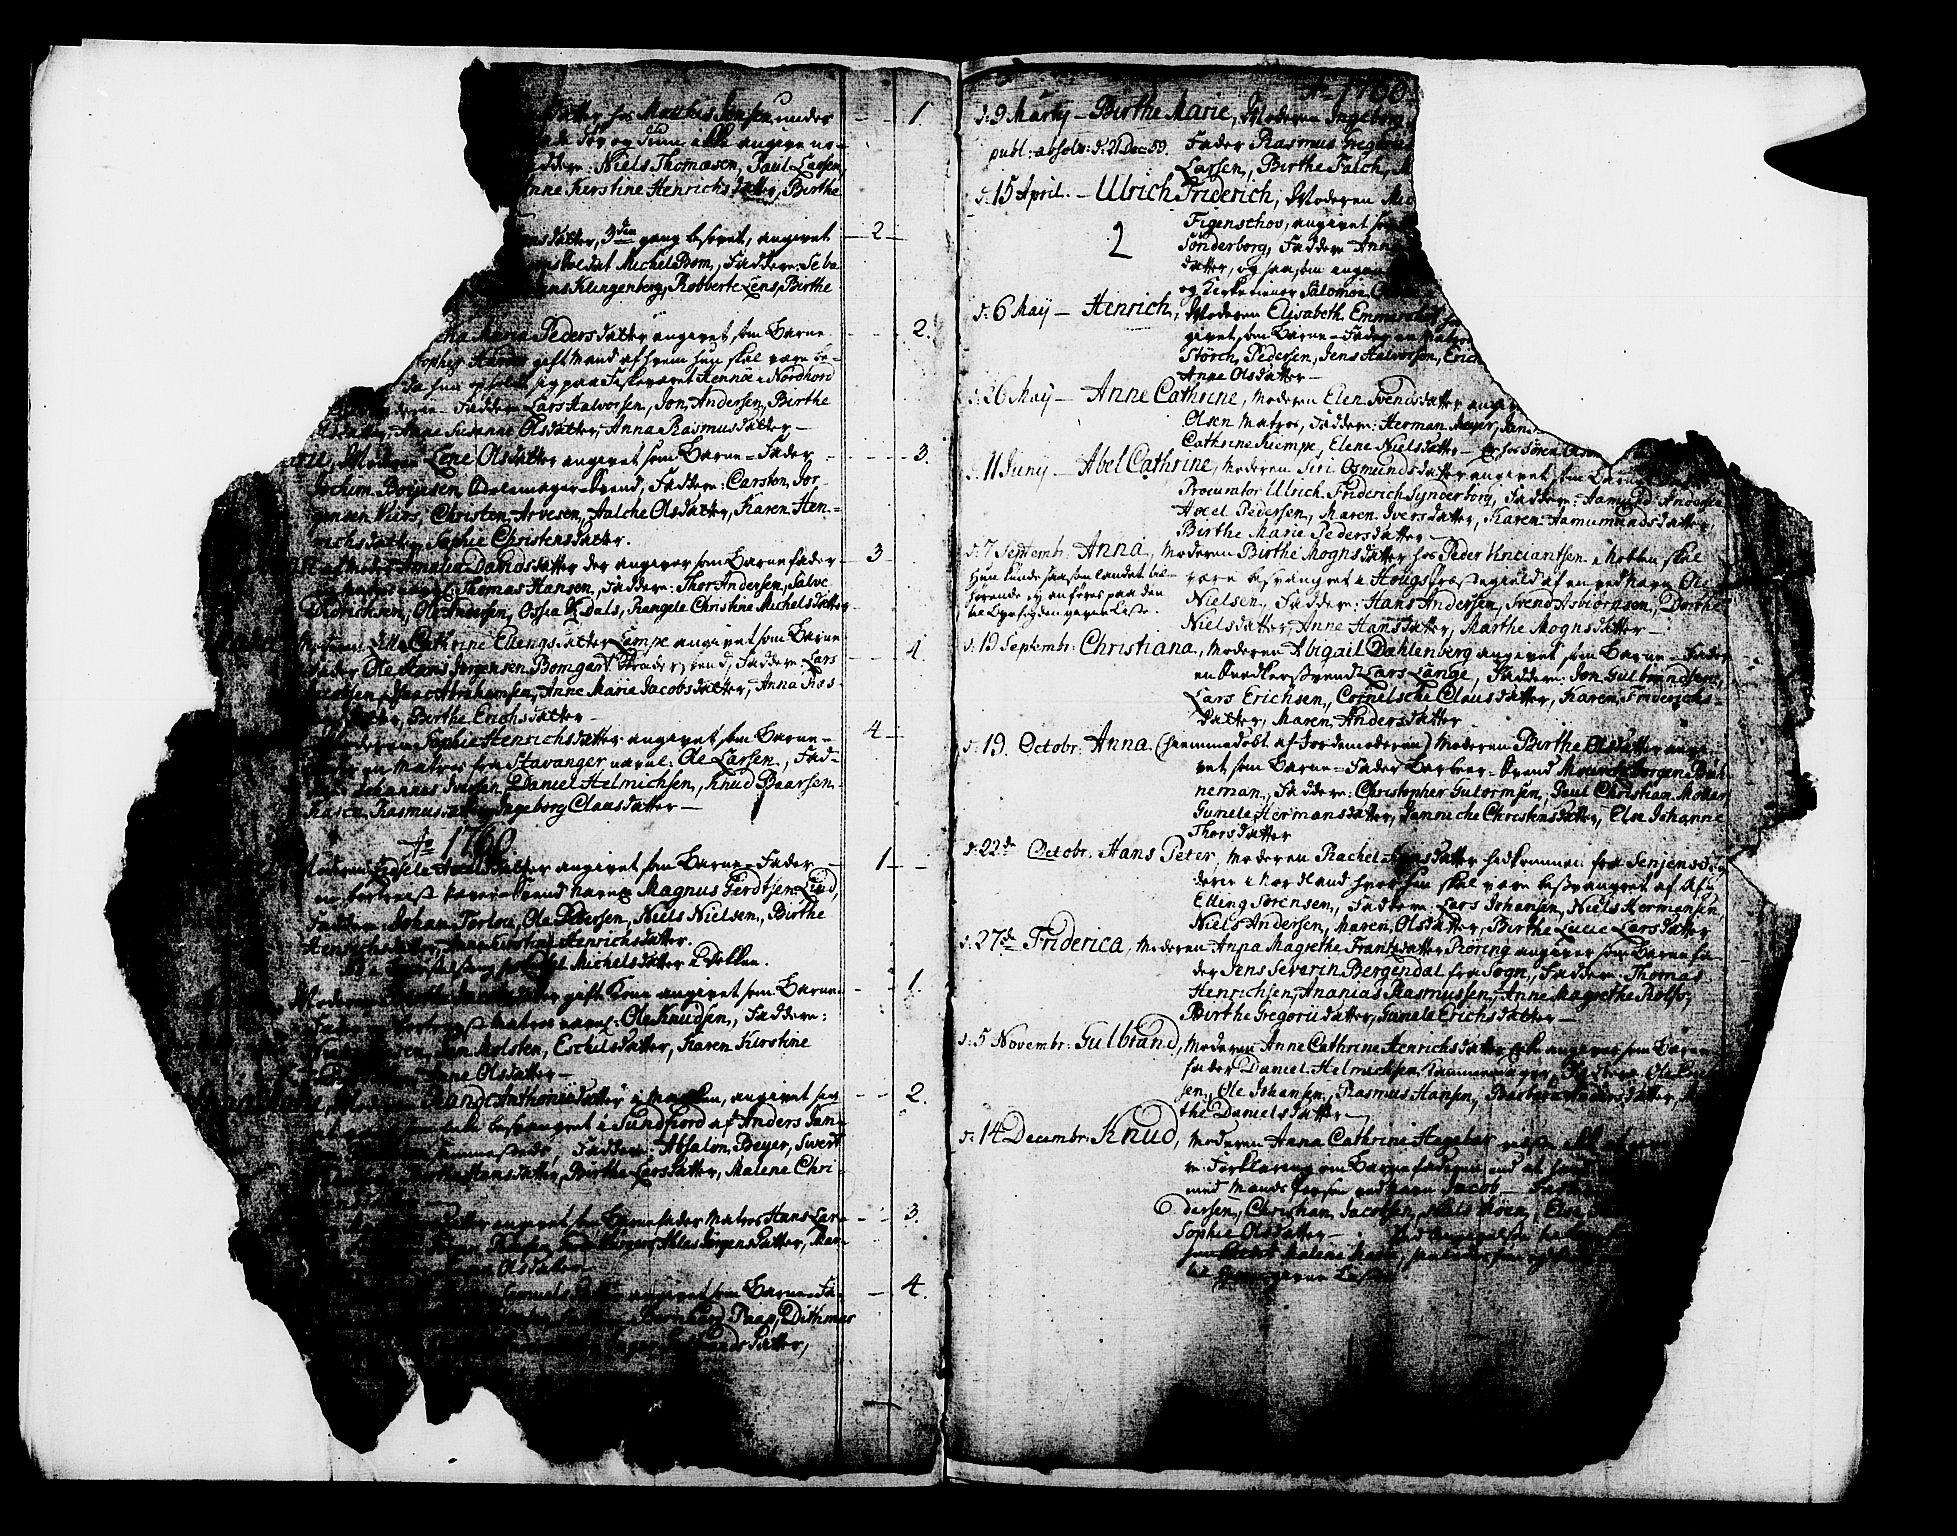 SAB, Domkirken Sokneprestembete, H/Haa/L0003: Ministerialbok nr. A 3, 1758-1789, s. 2